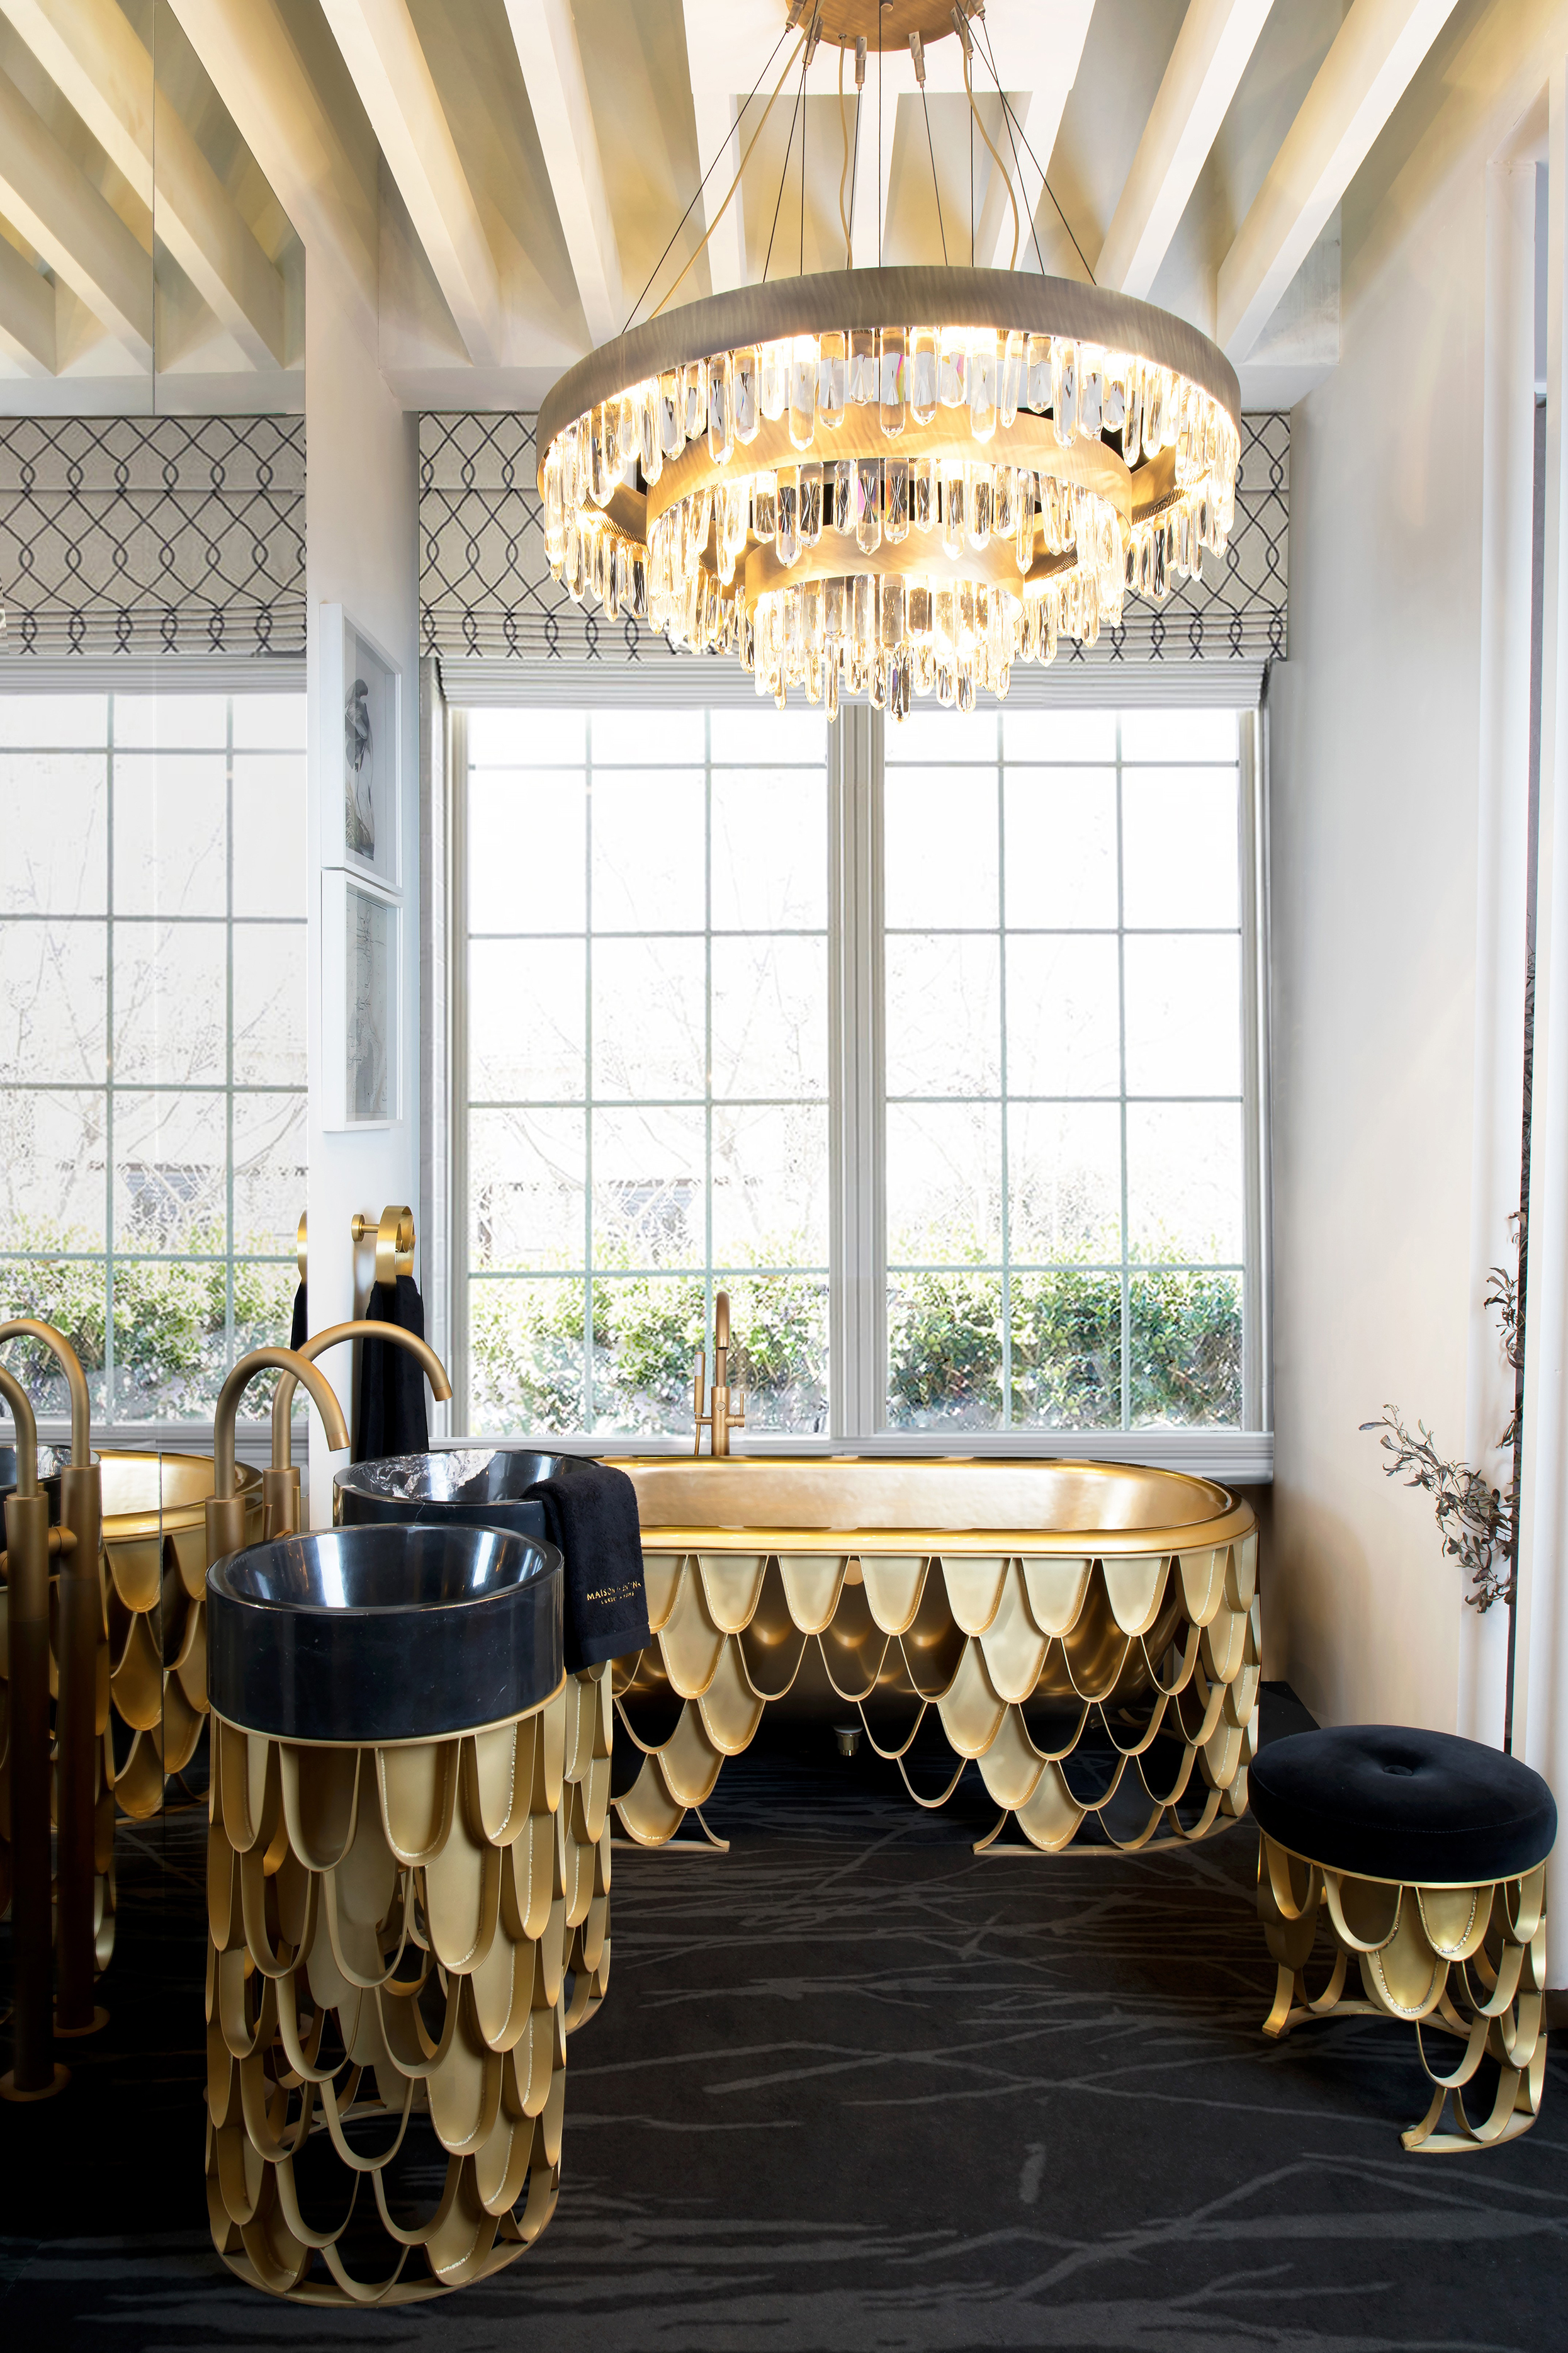 Decorating Bathroom with Golden Furniture Golden Furniture Decorating Bathroom with Golden Furniture golden guest bathroom decorated with koi pieces